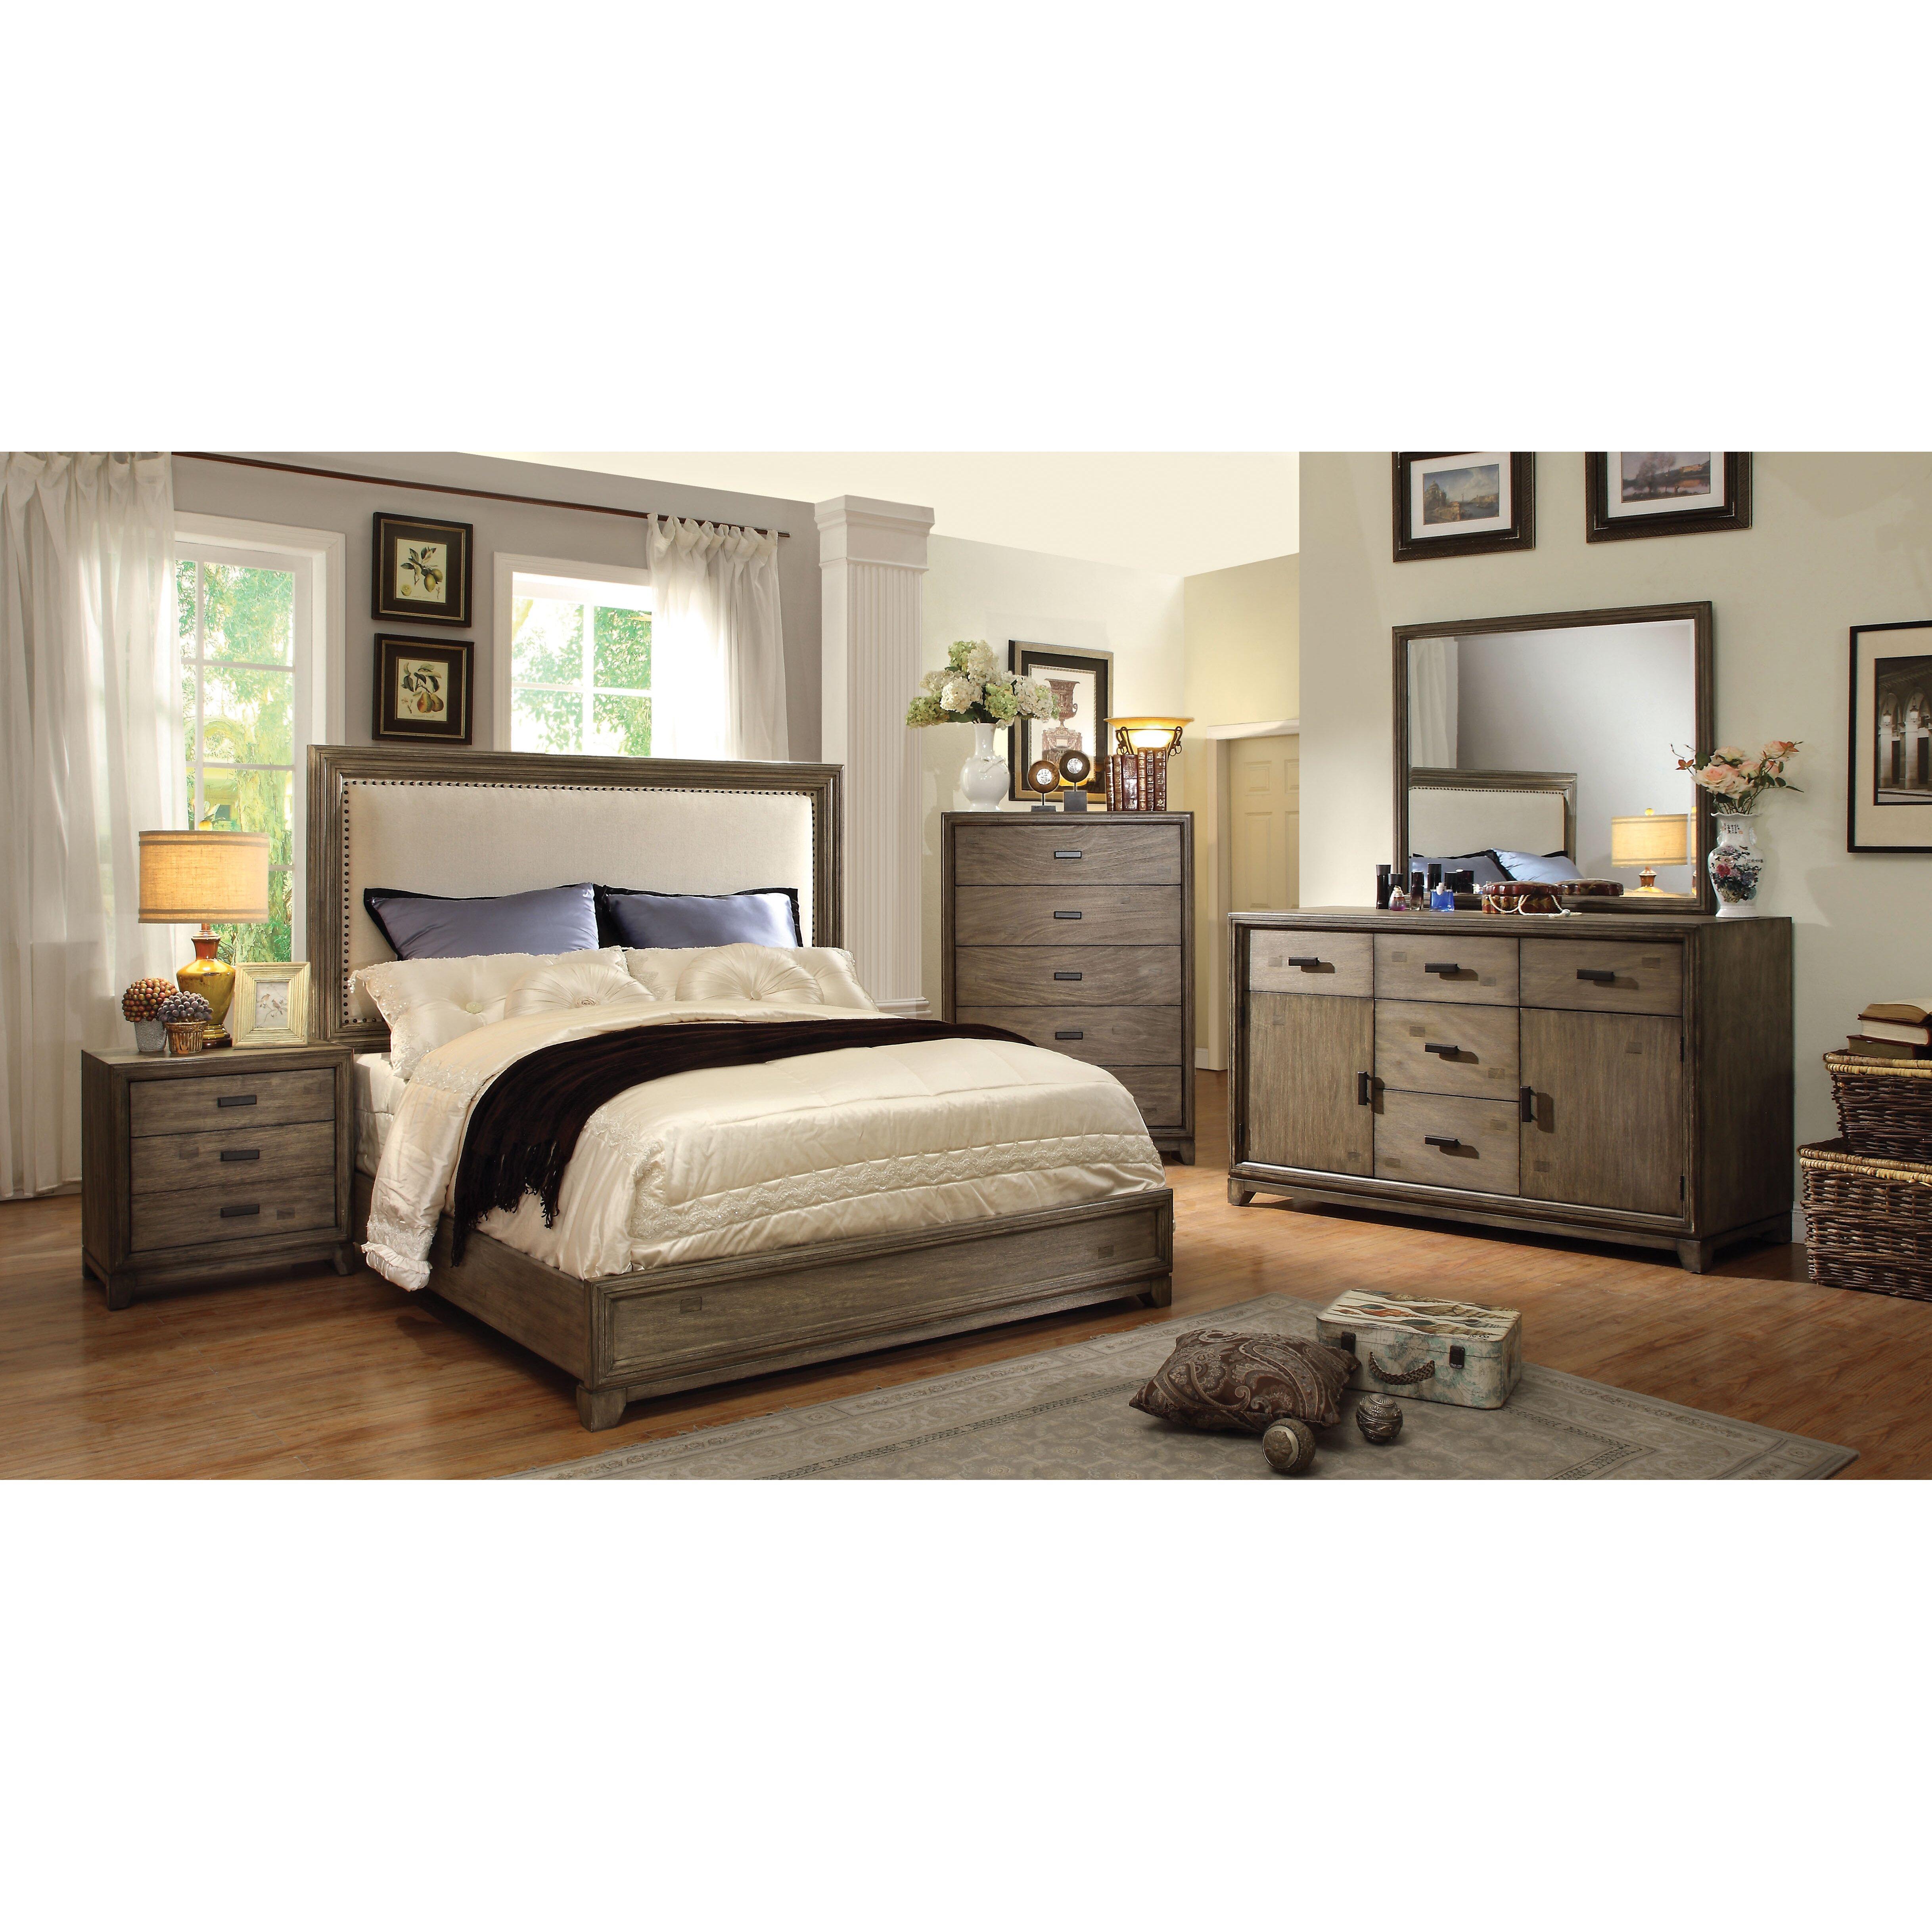 Hokku Designs Karla Platform Customizable Bedroom Set